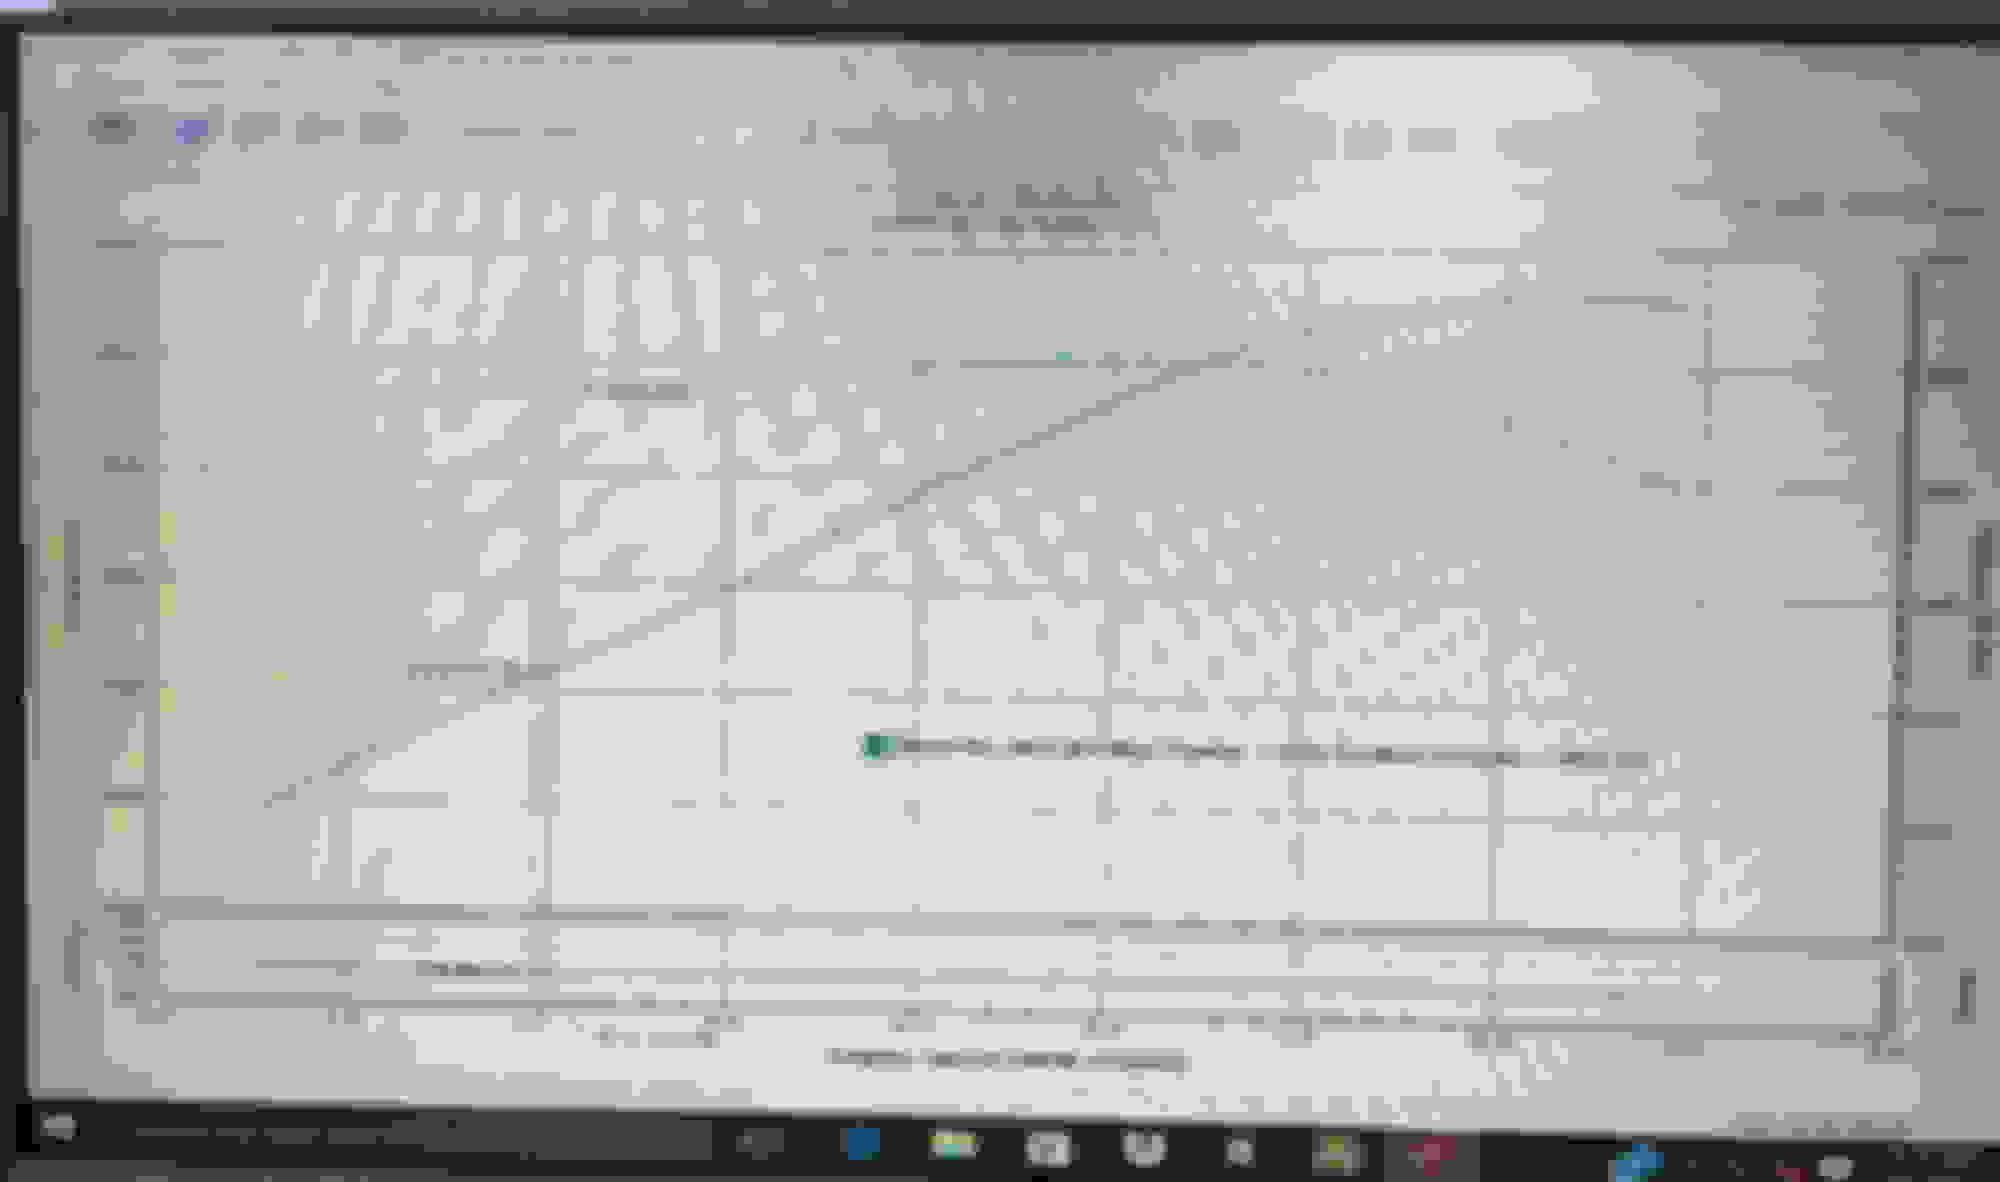 btr stage 3 cam? - Page 4 - PerformanceTrucks net Forums